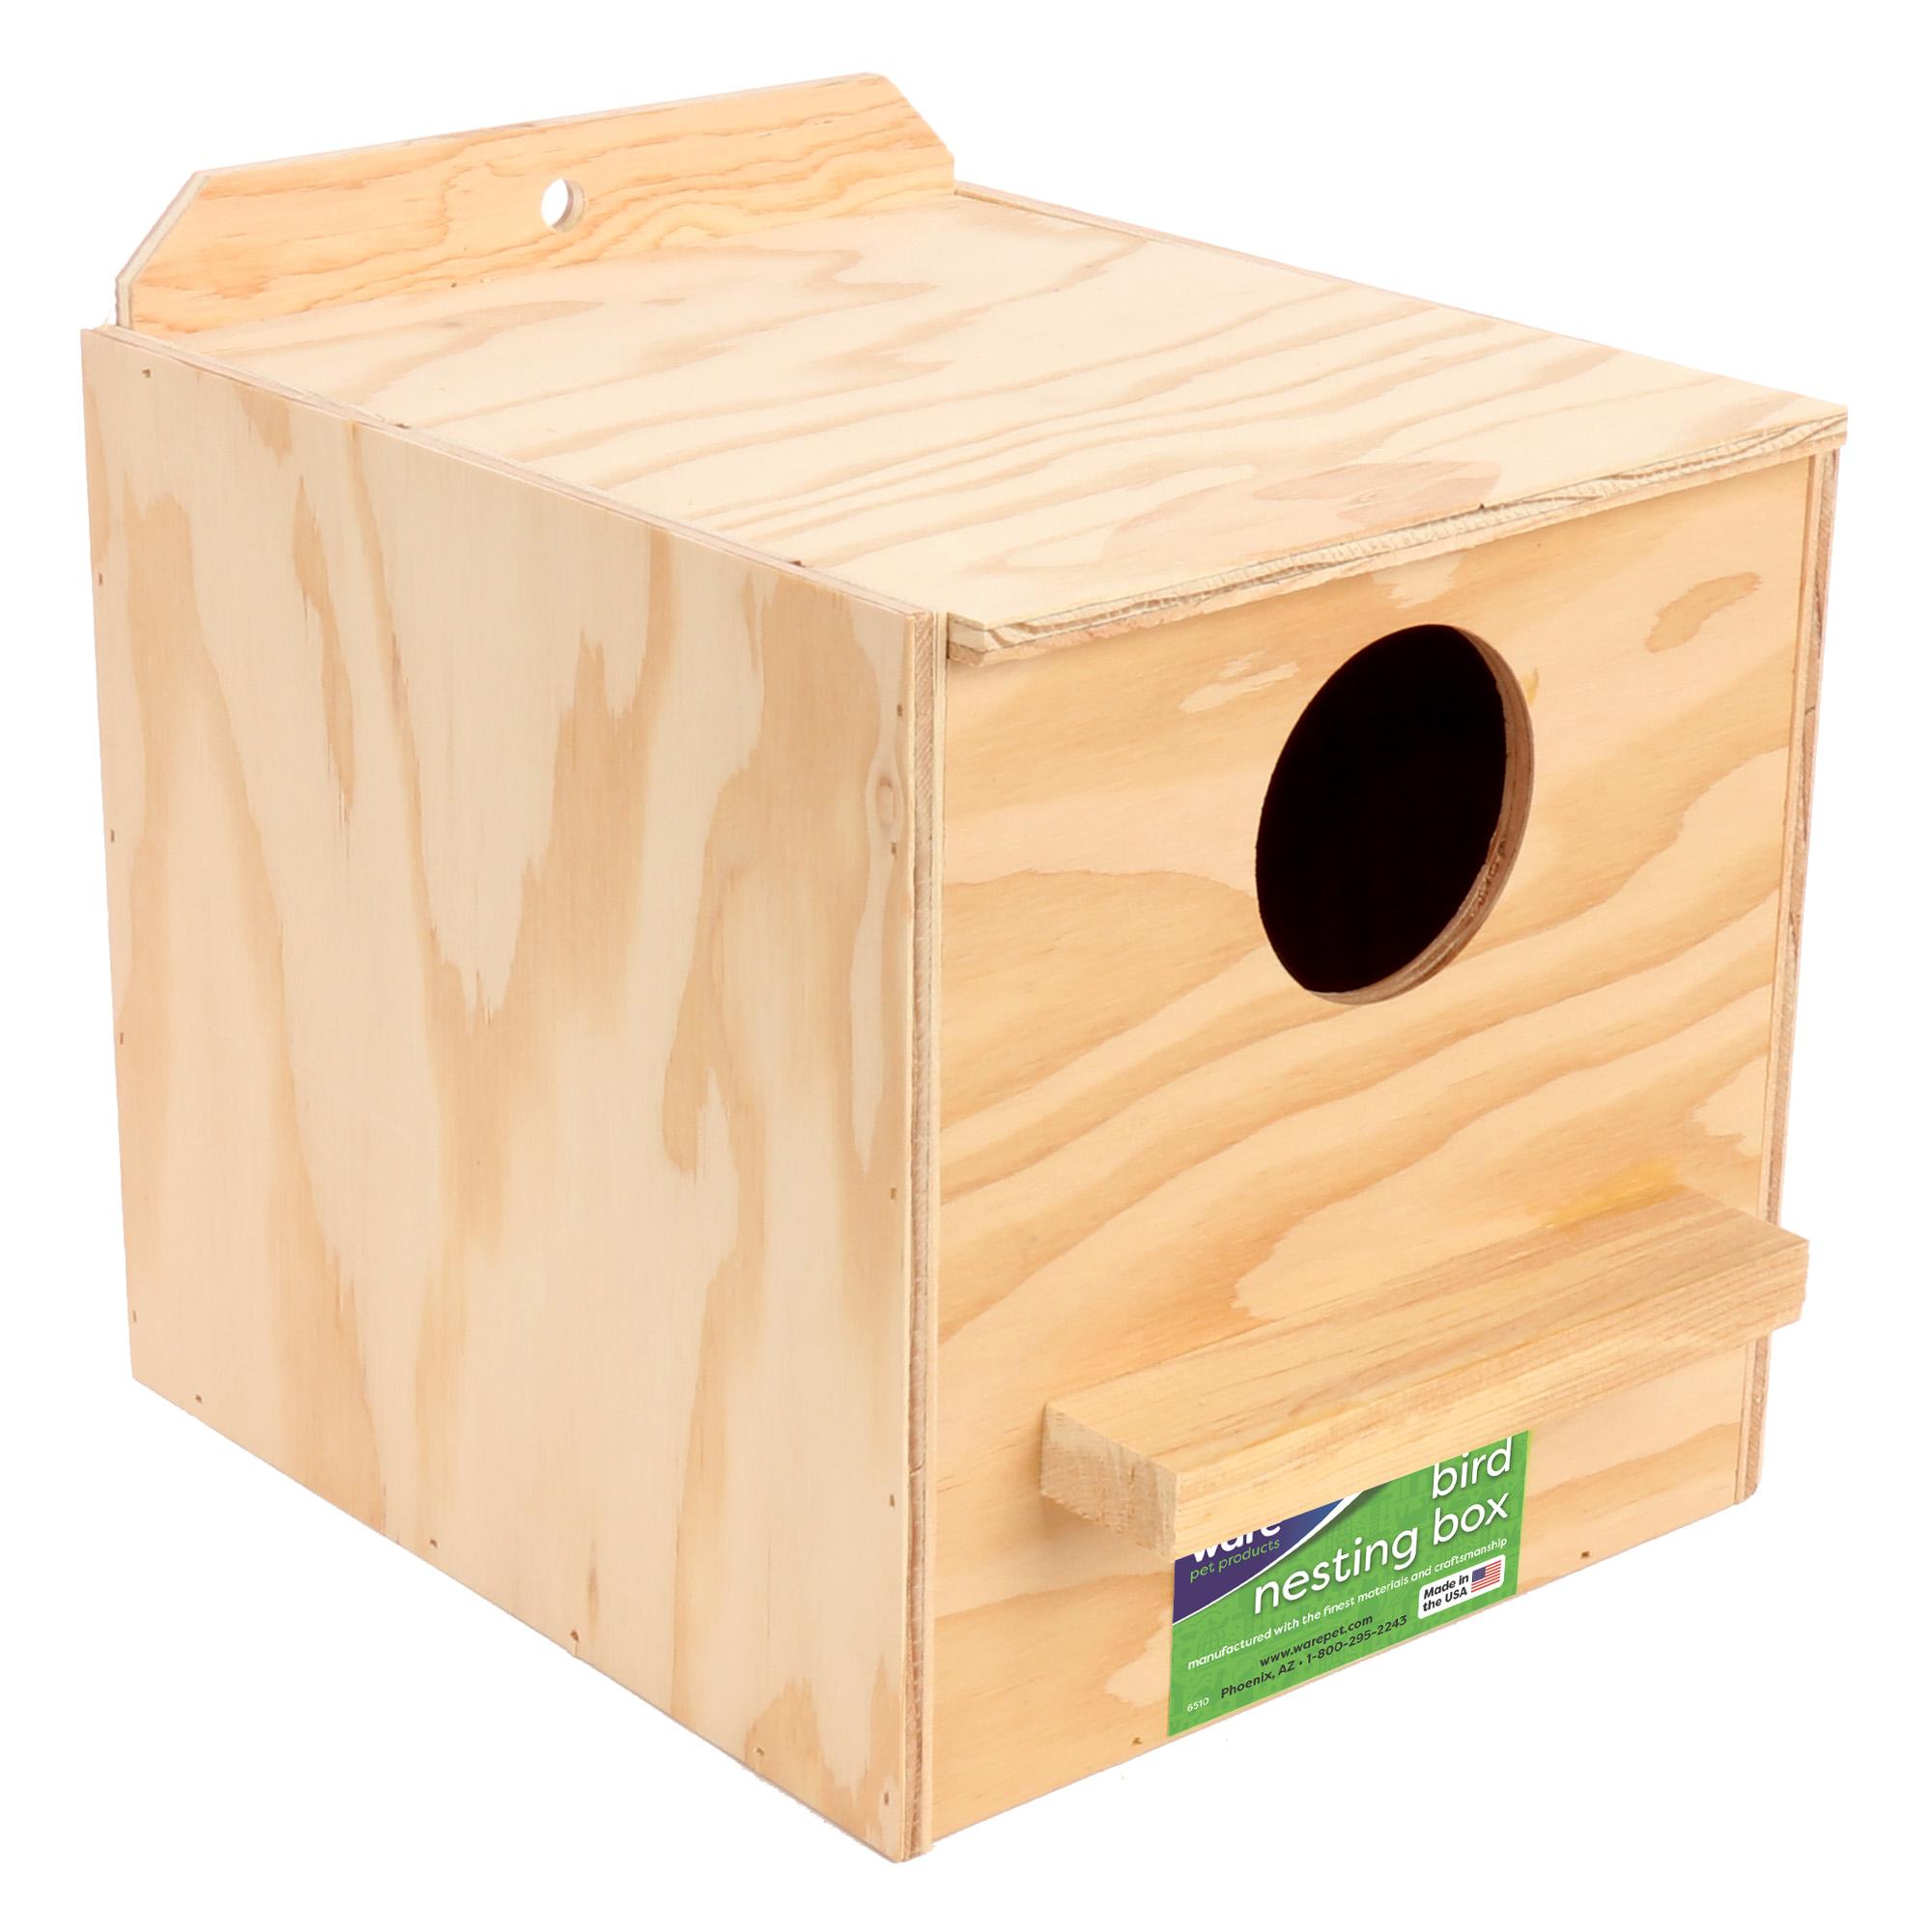 Nest Box, Cockatiel, Regular